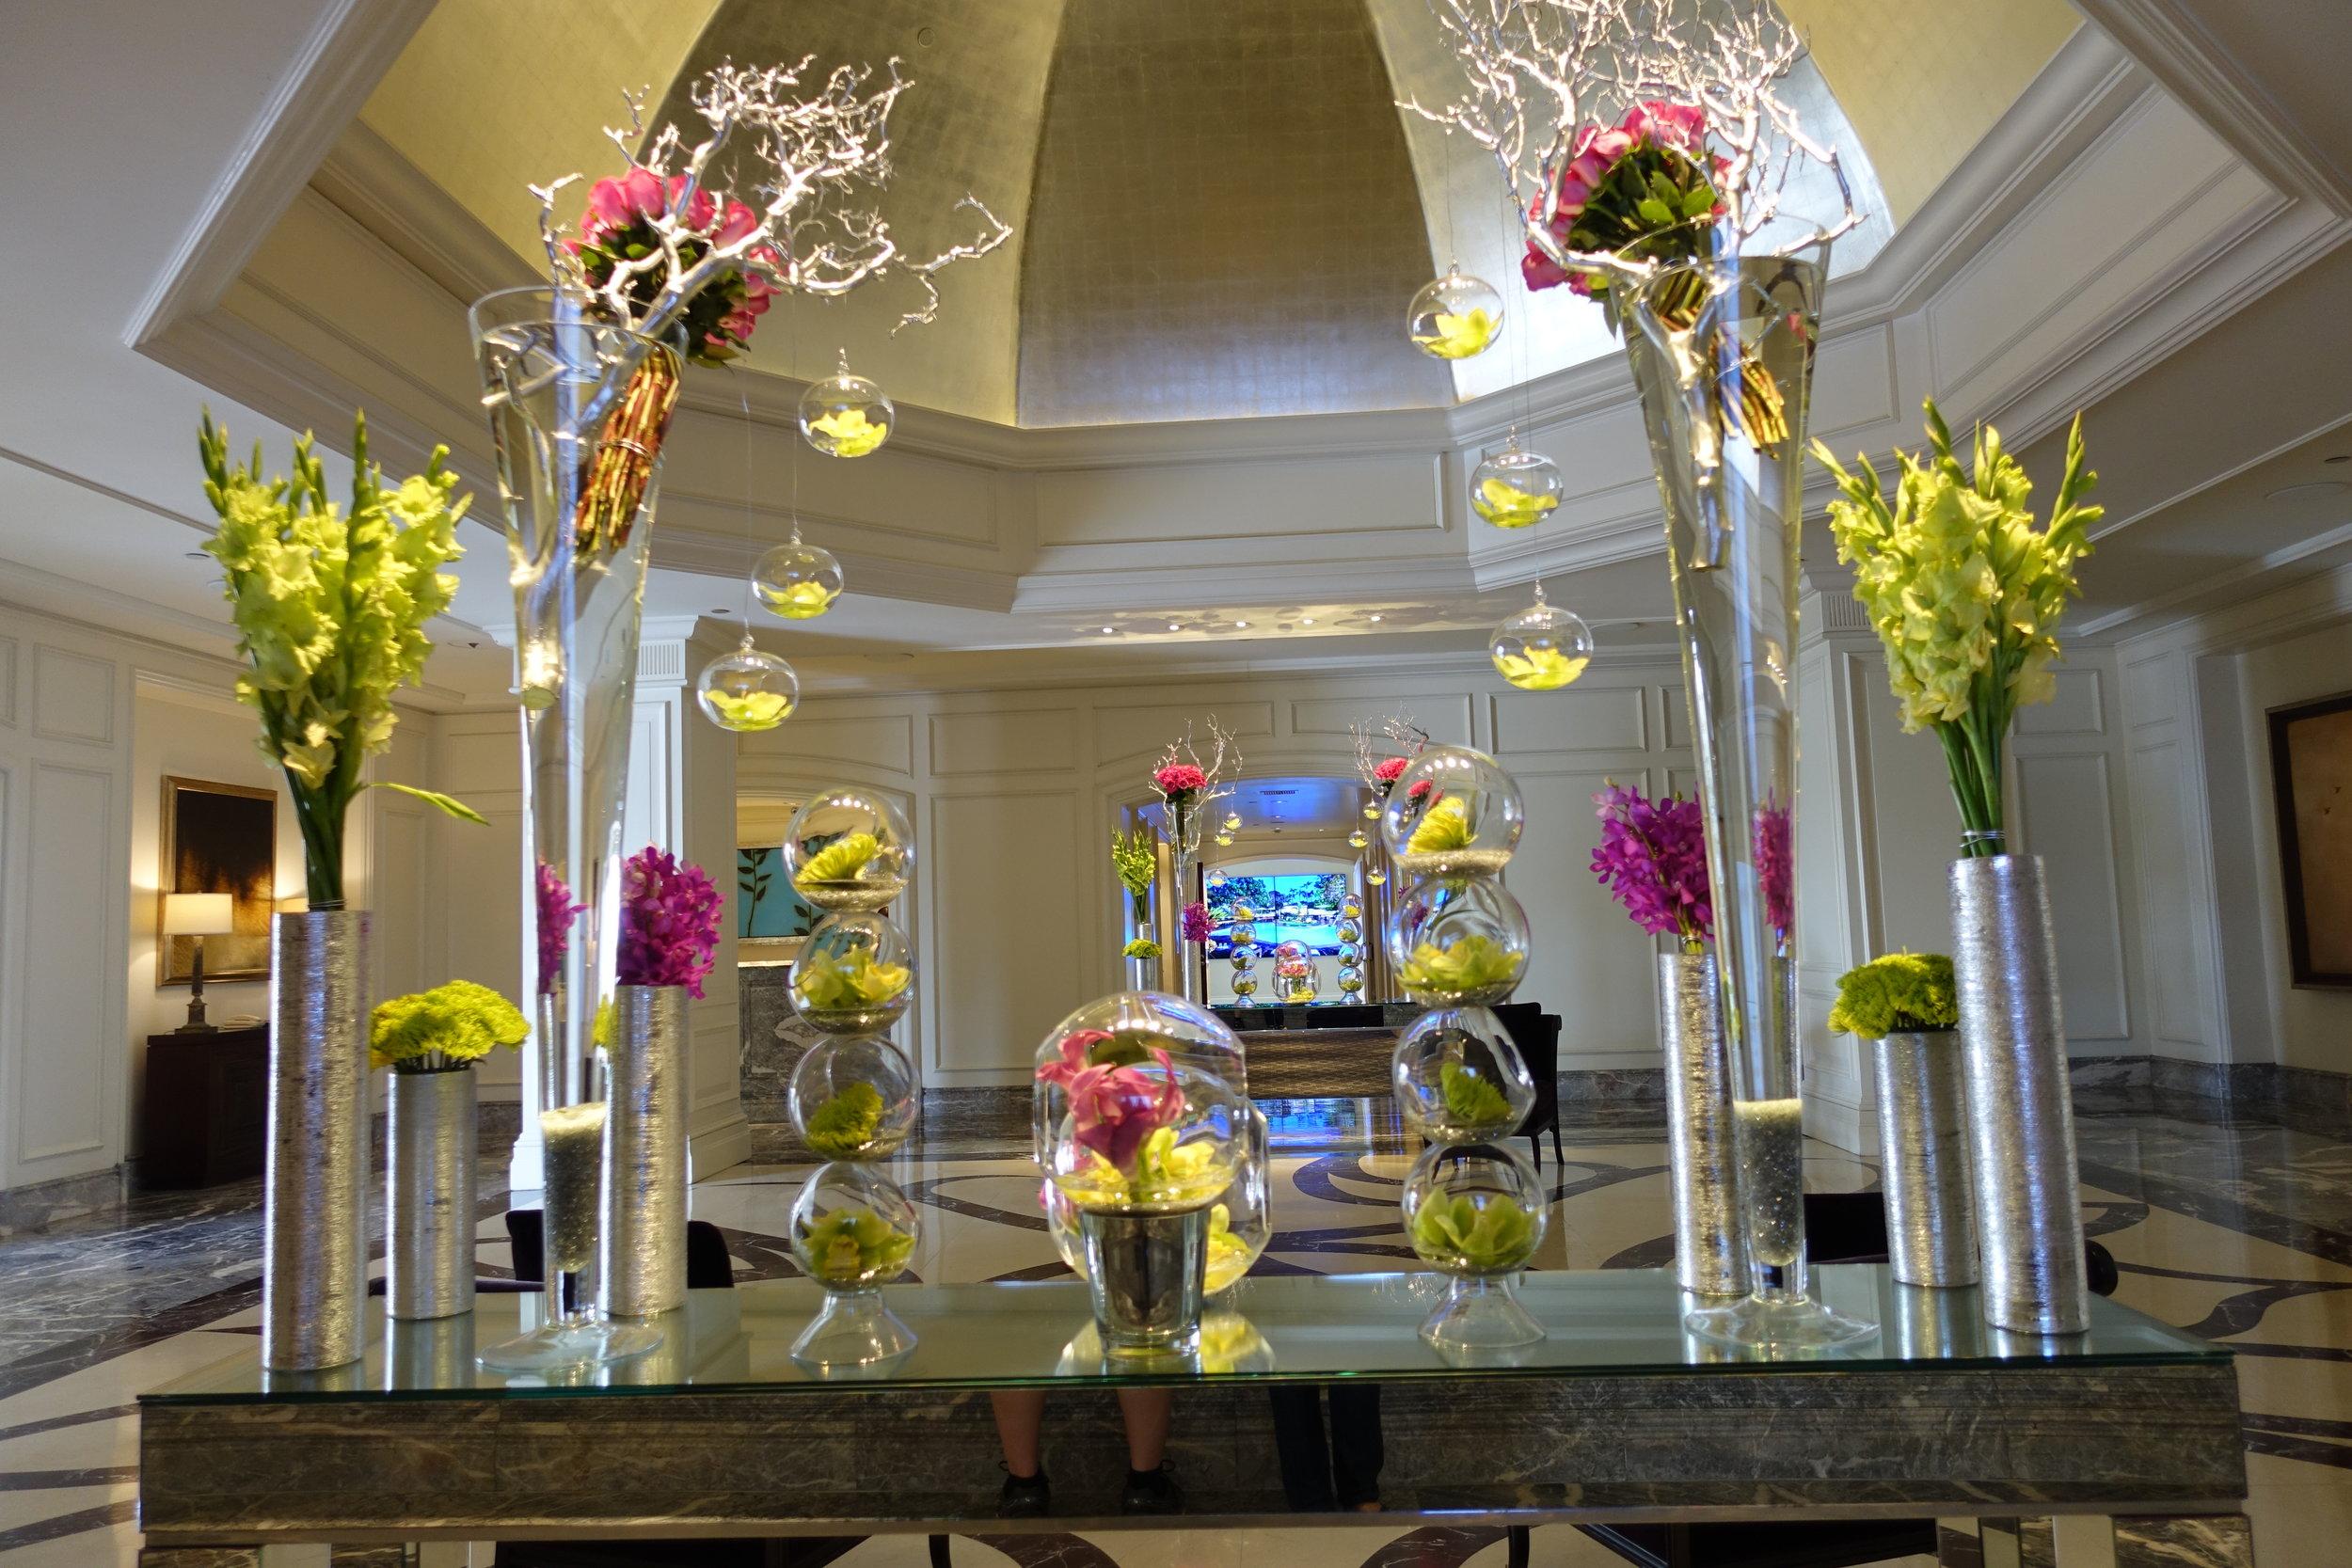 Ritz-Carlton Laguna Nigel lobby